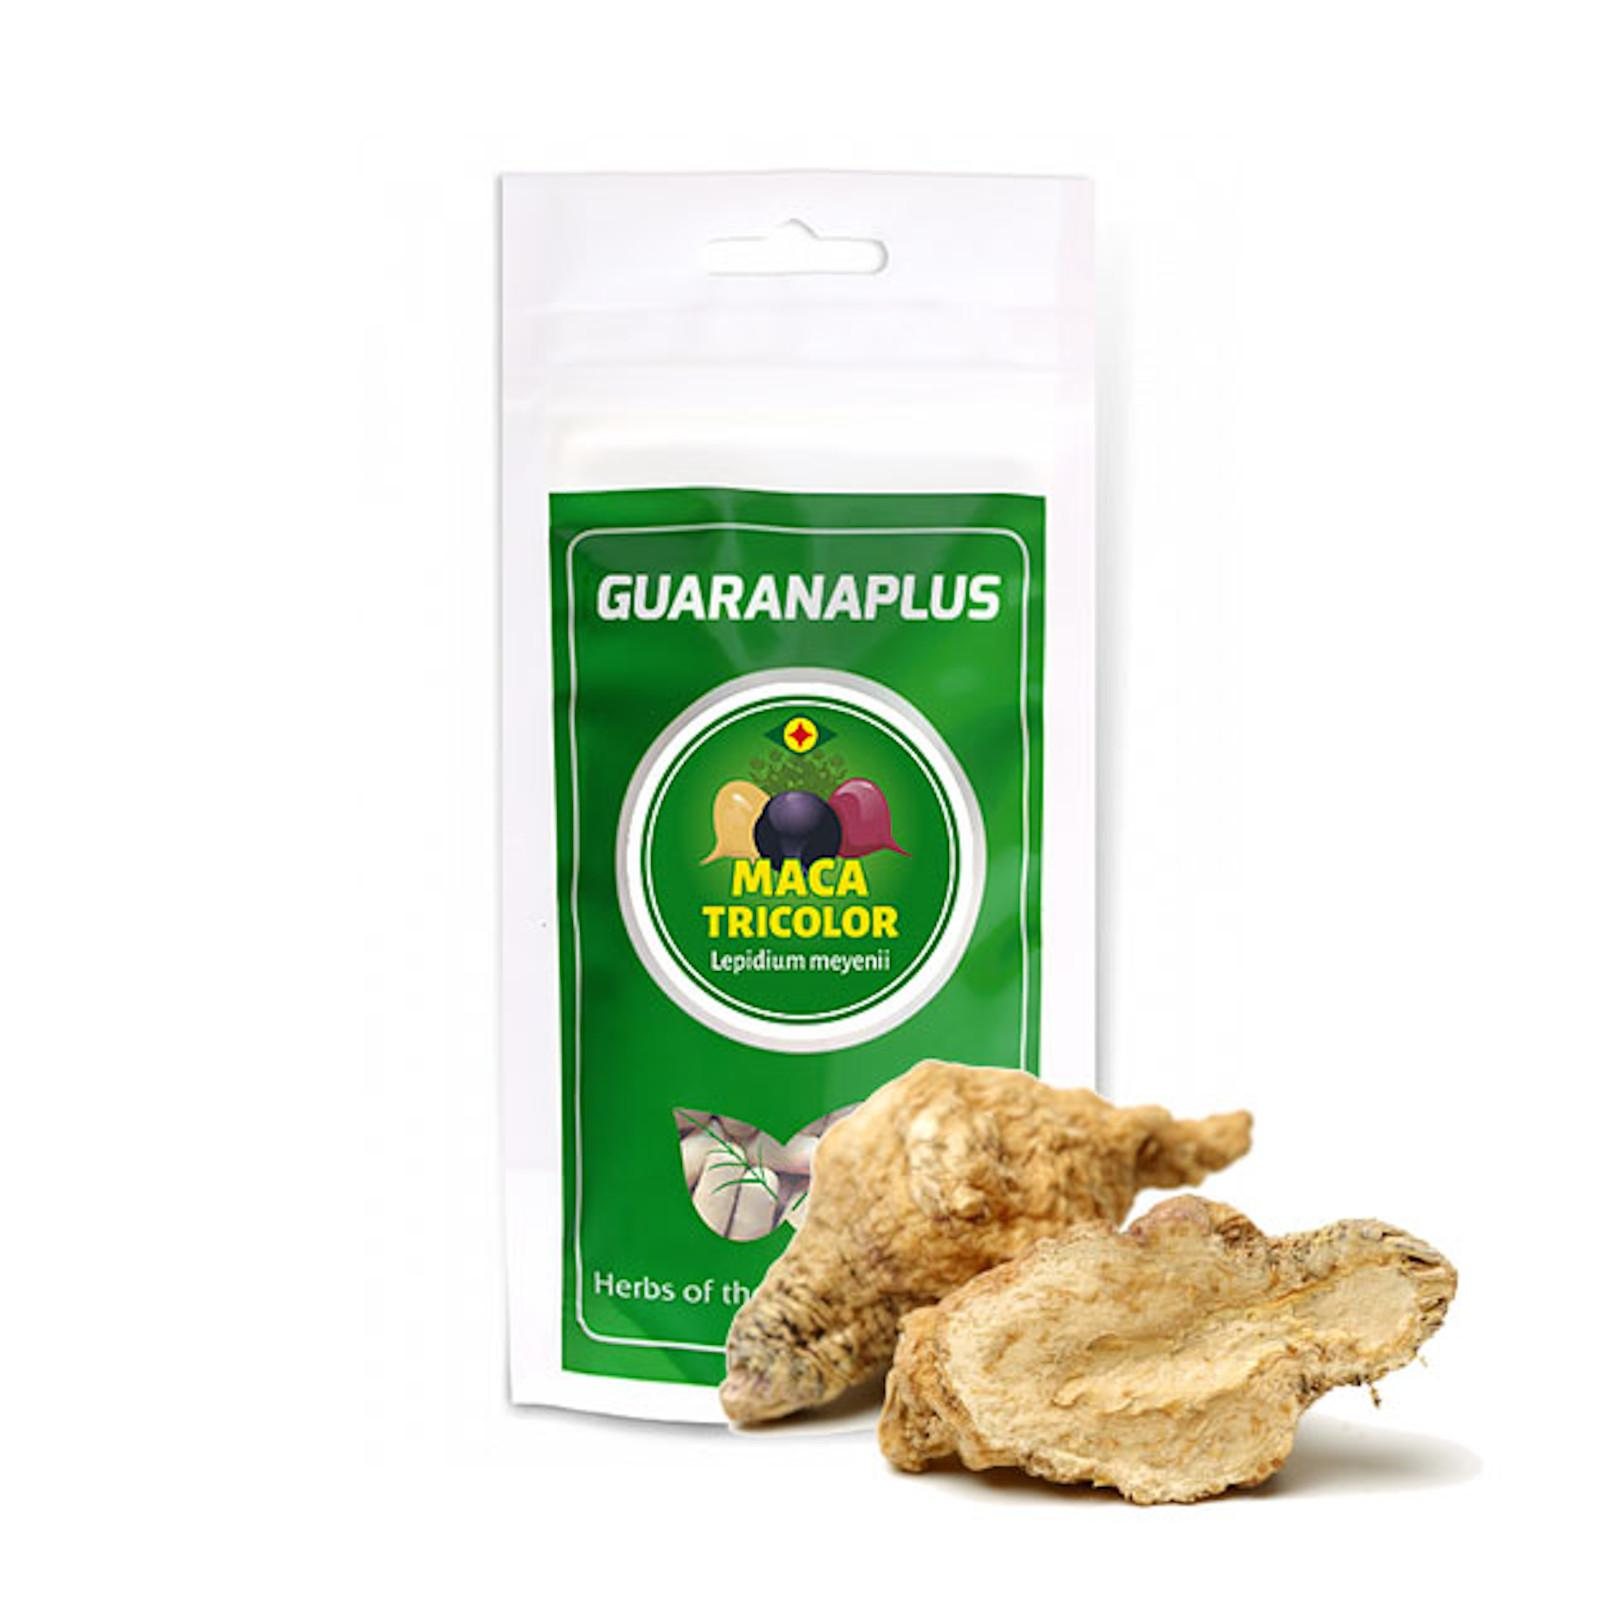 Guaranaplus Maca Tricolor 100 kapslí